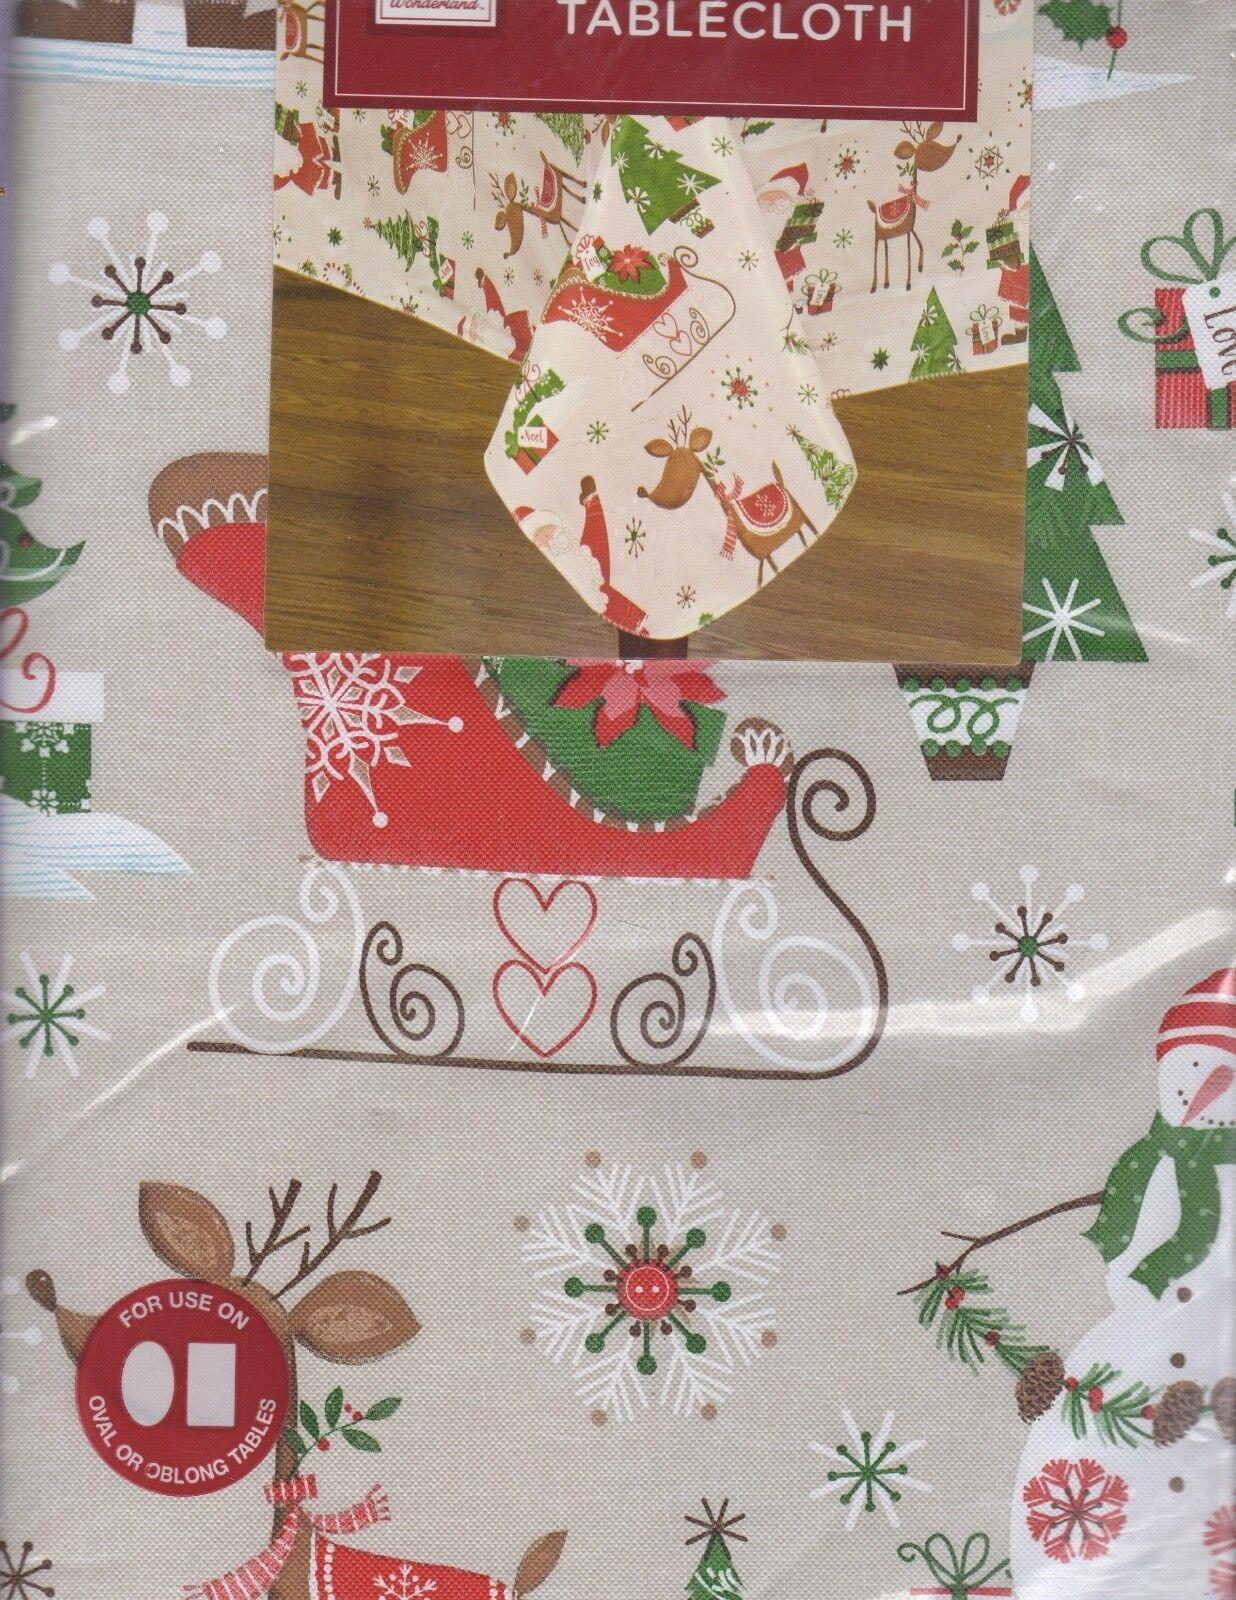 NEW MAGICAL JOURNEY CHRISTMAS TABLECLOTH VINYL FLANNEL BACKE